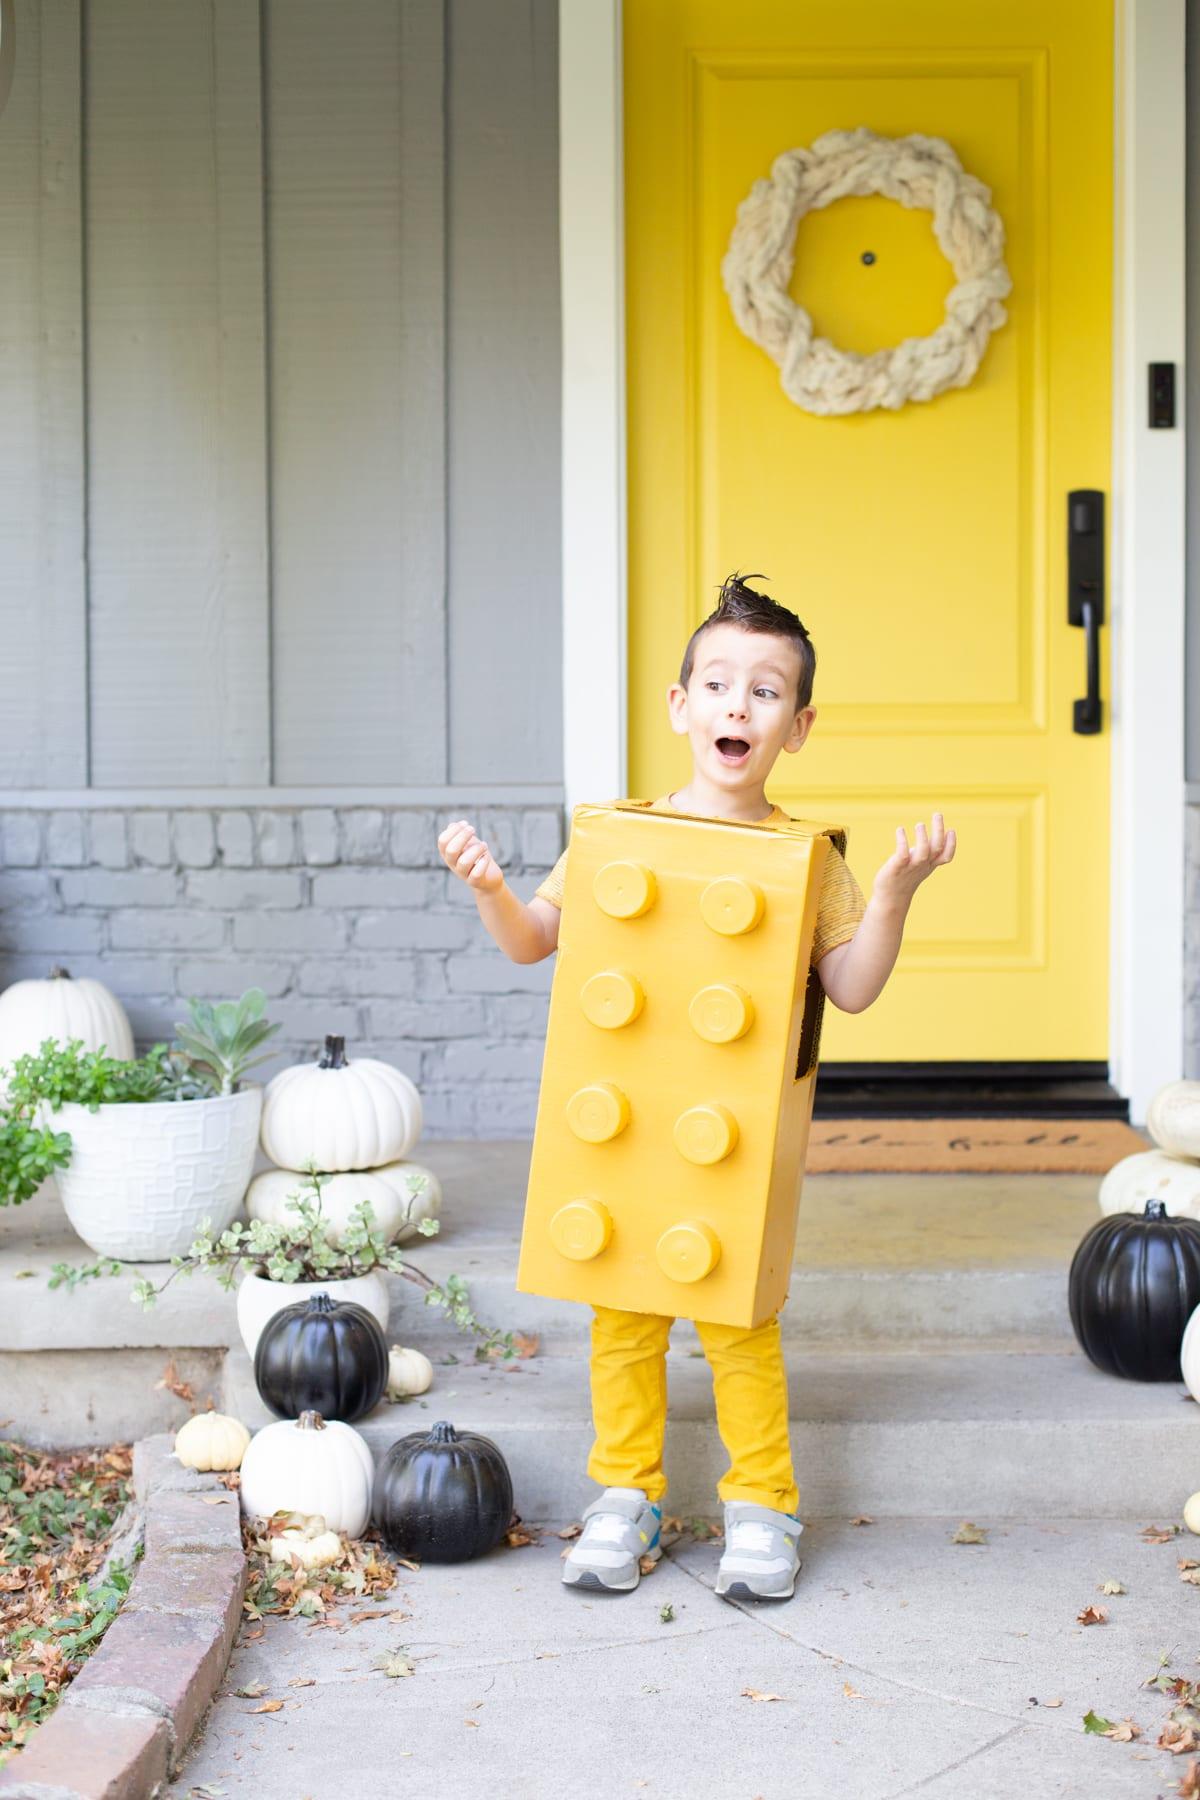 How to make a Lego Halloween costume